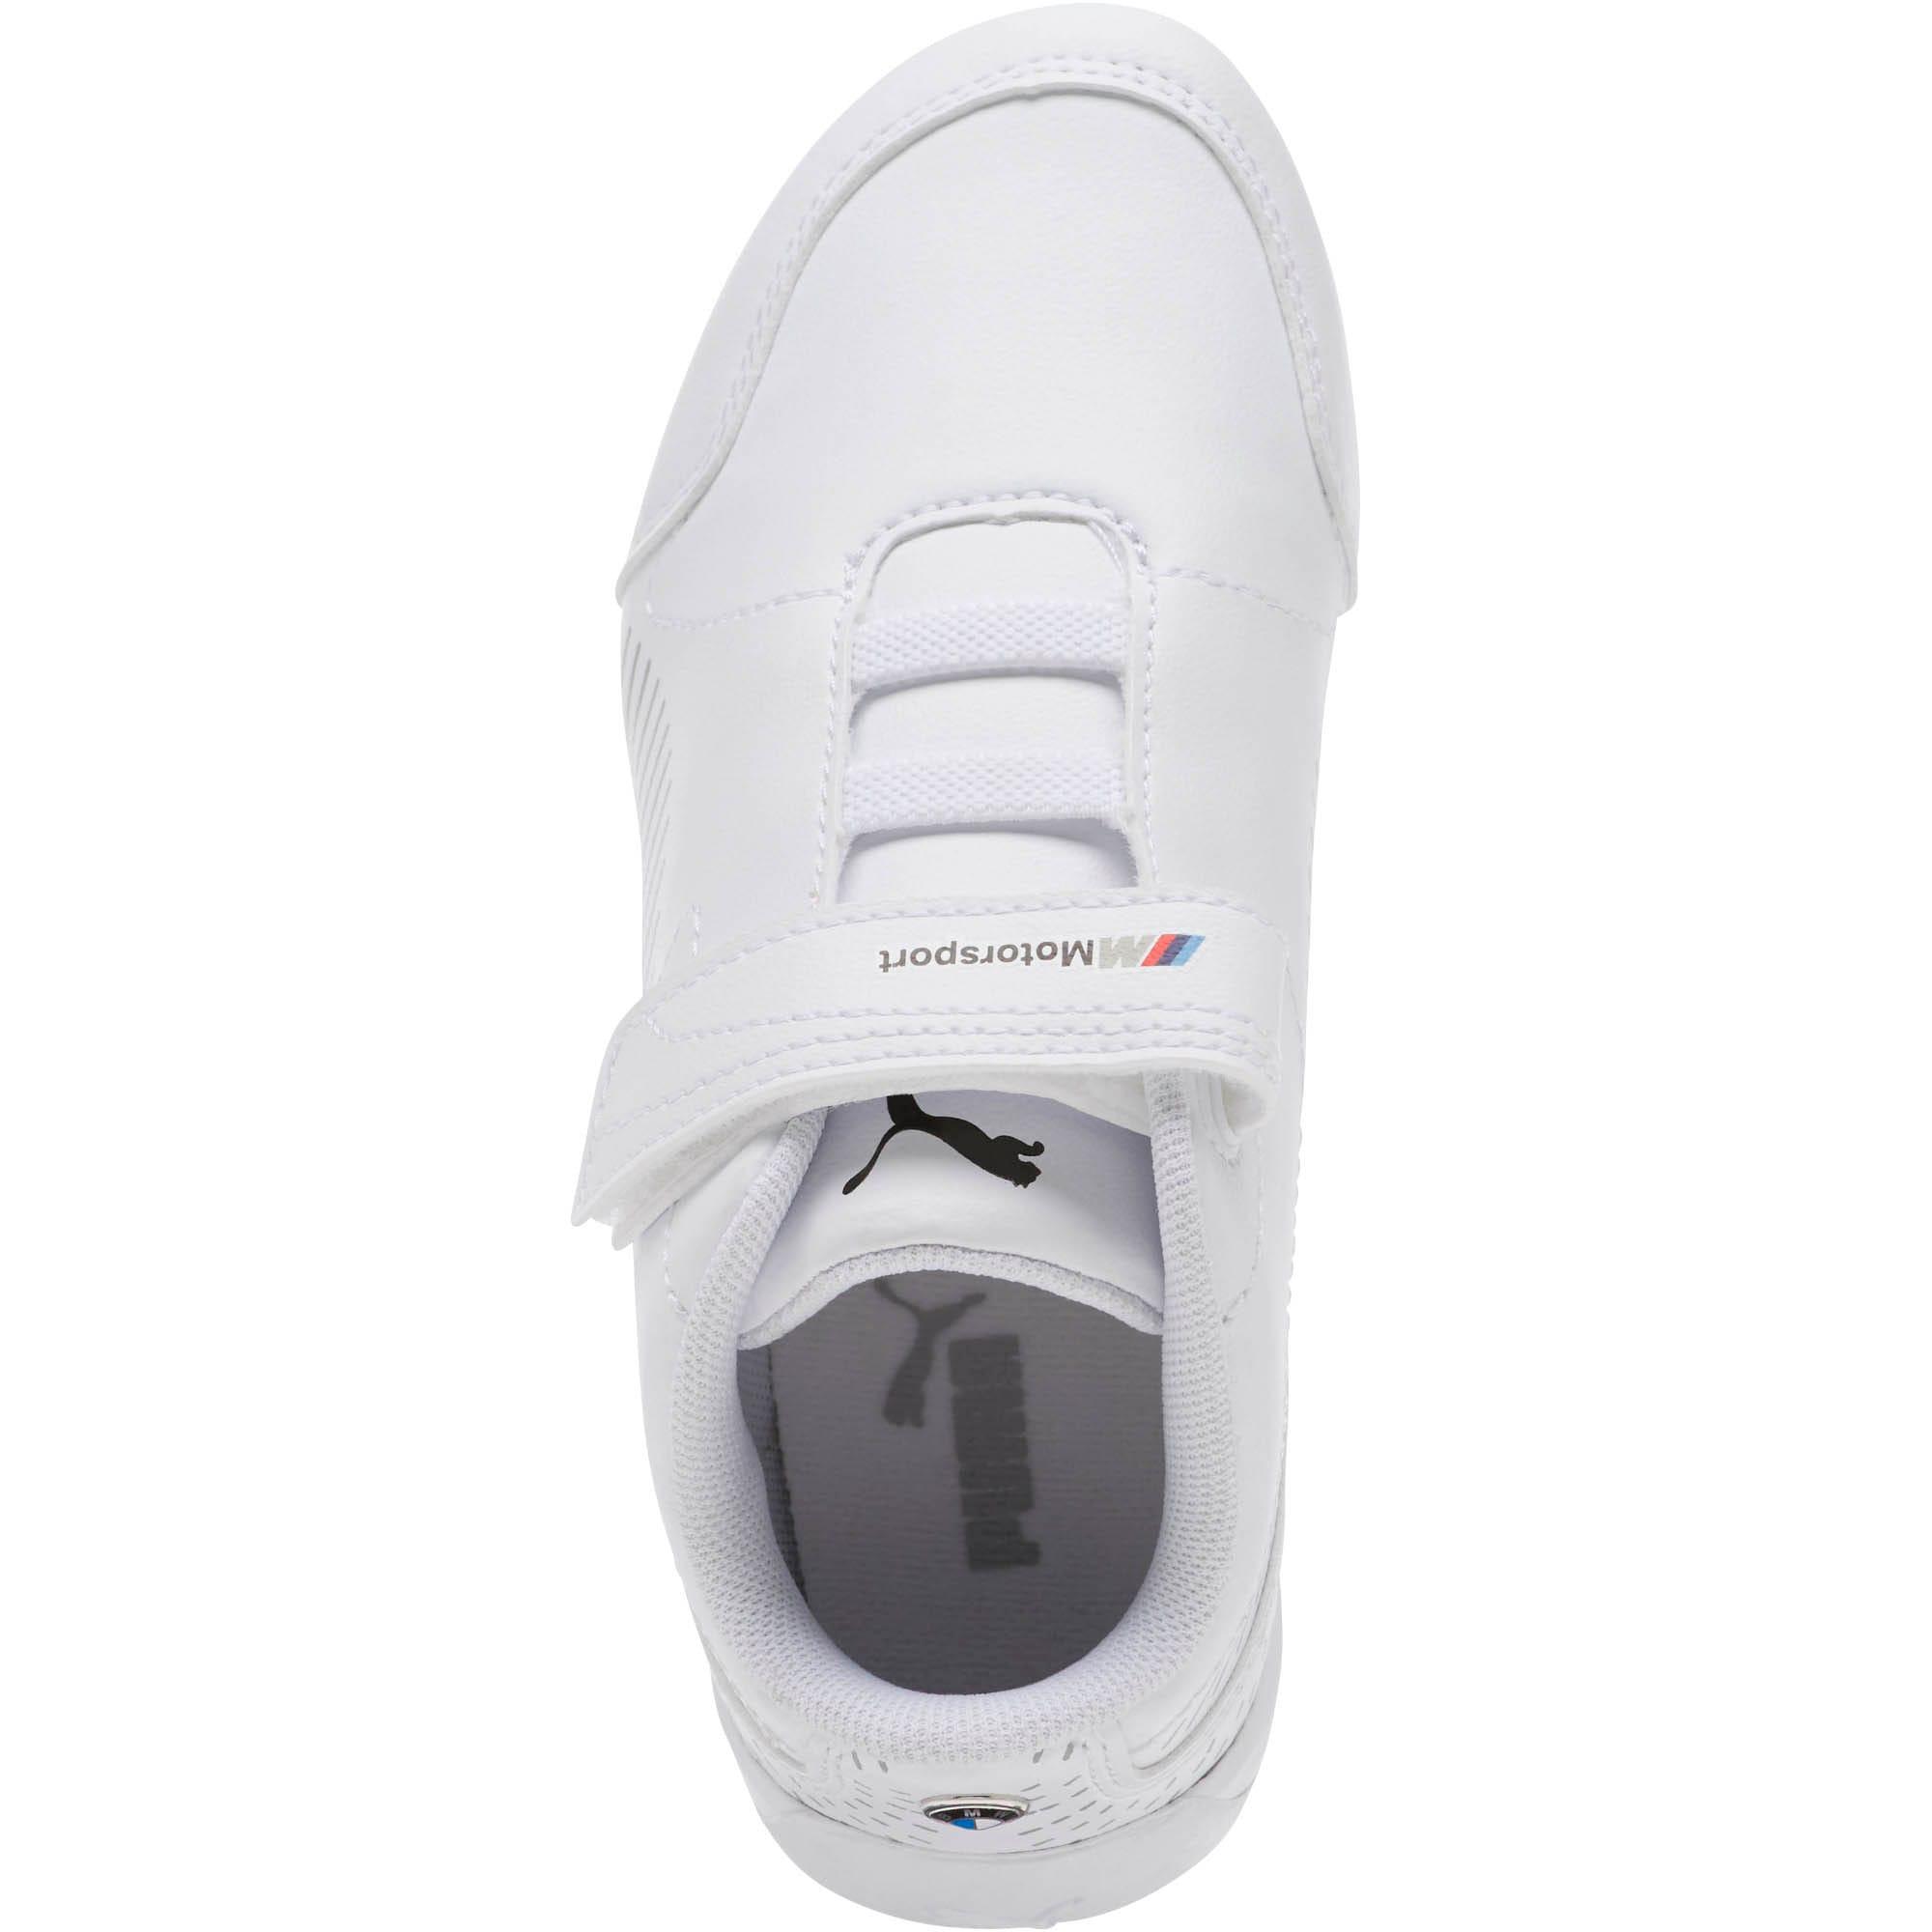 Thumbnail 5 of BMW MMS Drift Cat 7S Ultra Little Kids' Shoes, Puma White-Puma White, medium